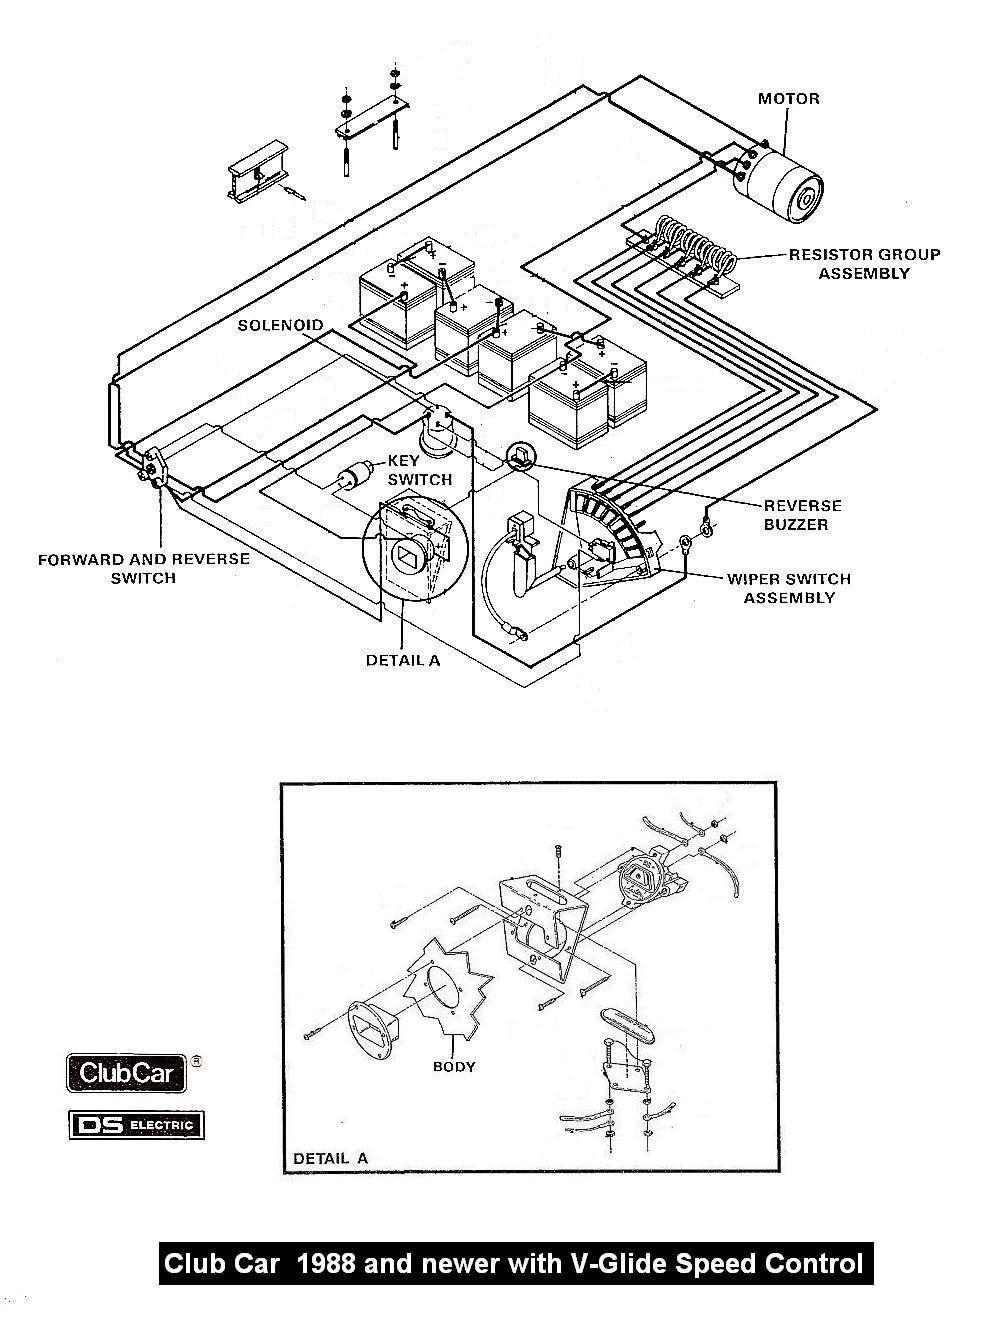 Club Car Parts Diagram Front End Gas Club Car Wiring Diagrams – Readingrat